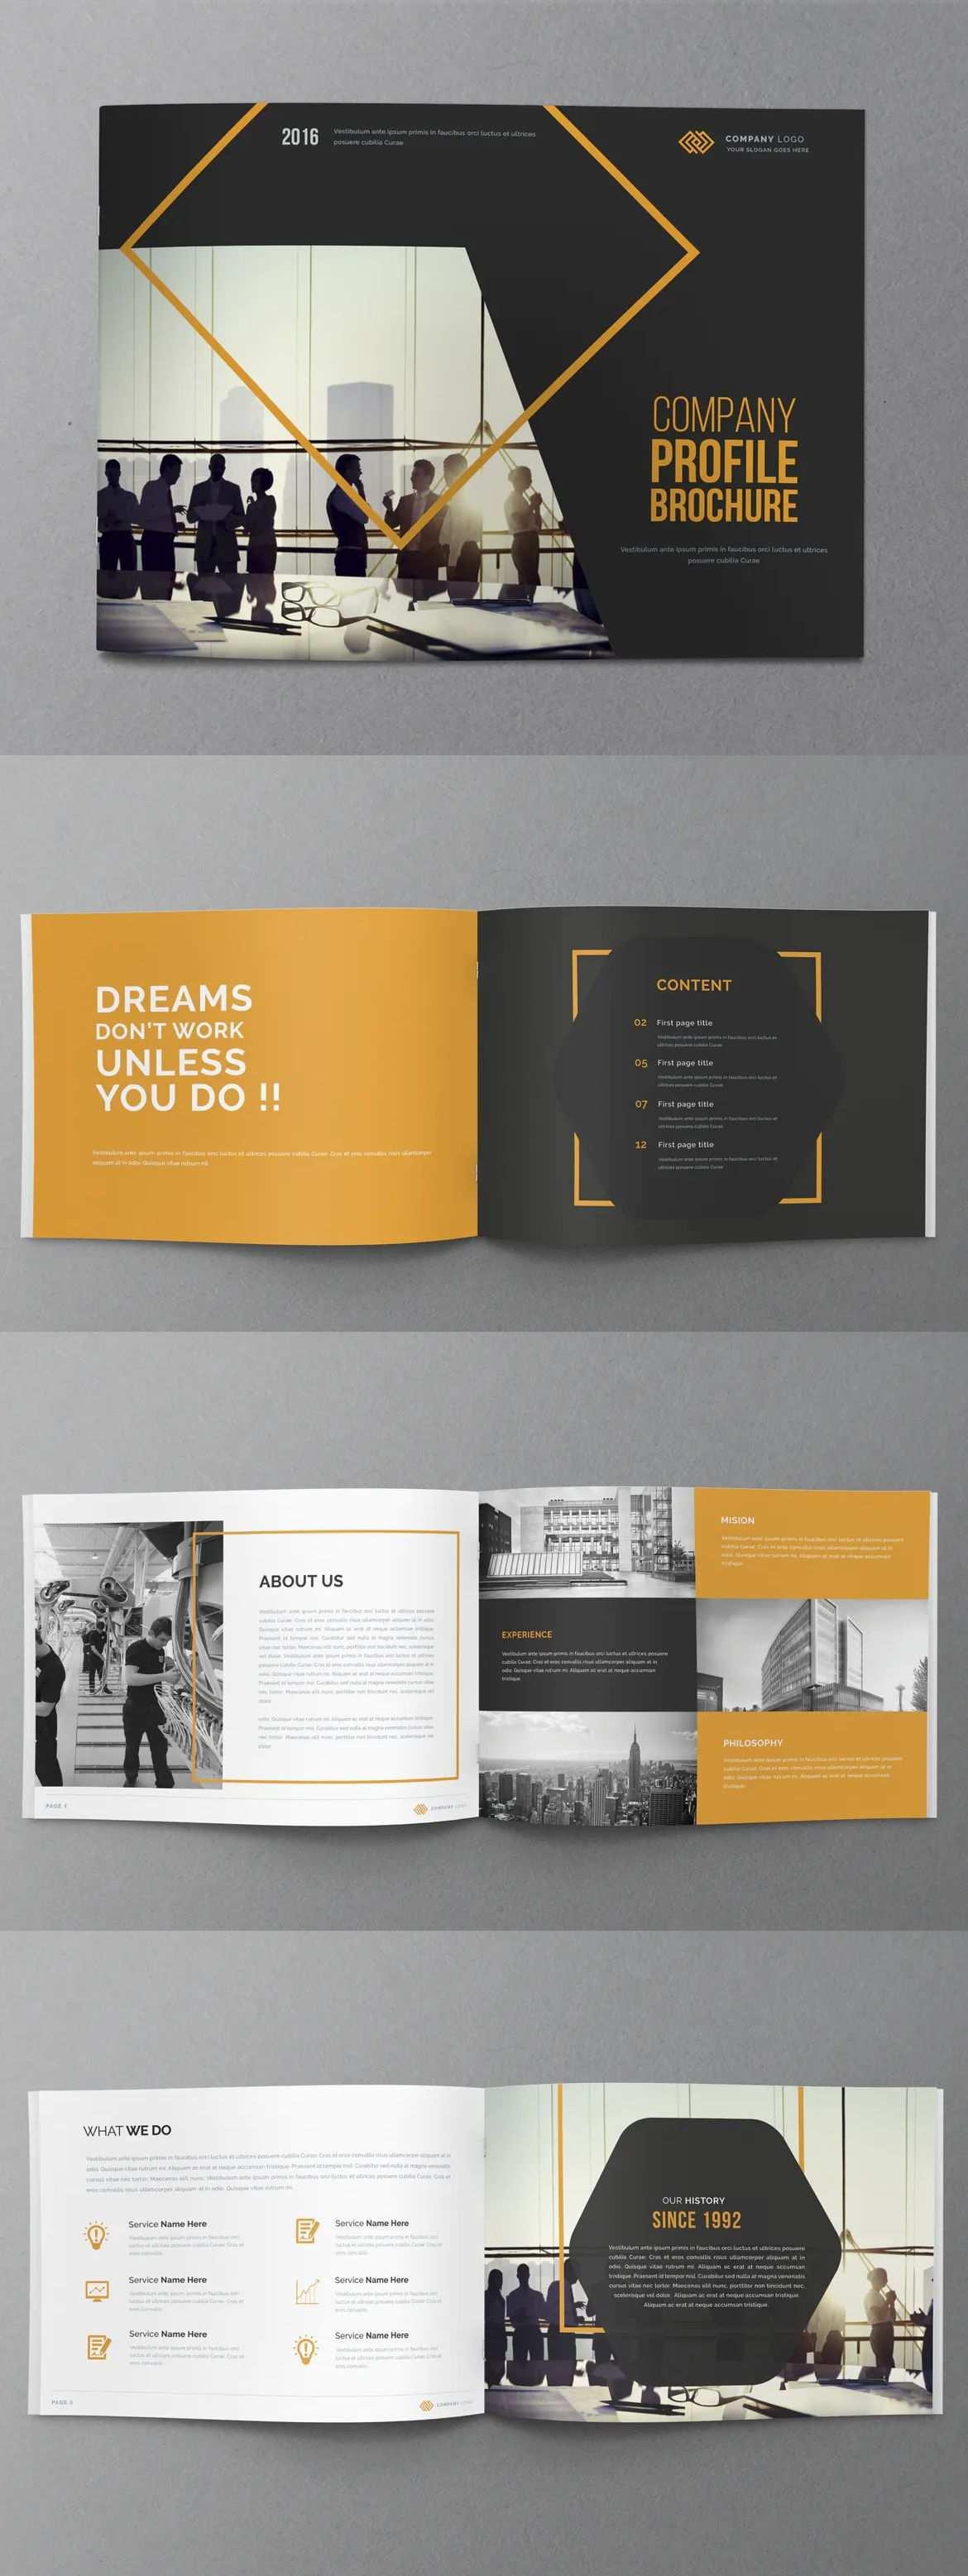 Company Profile Brochure Template Indesign Indd Desain Grafis Anak